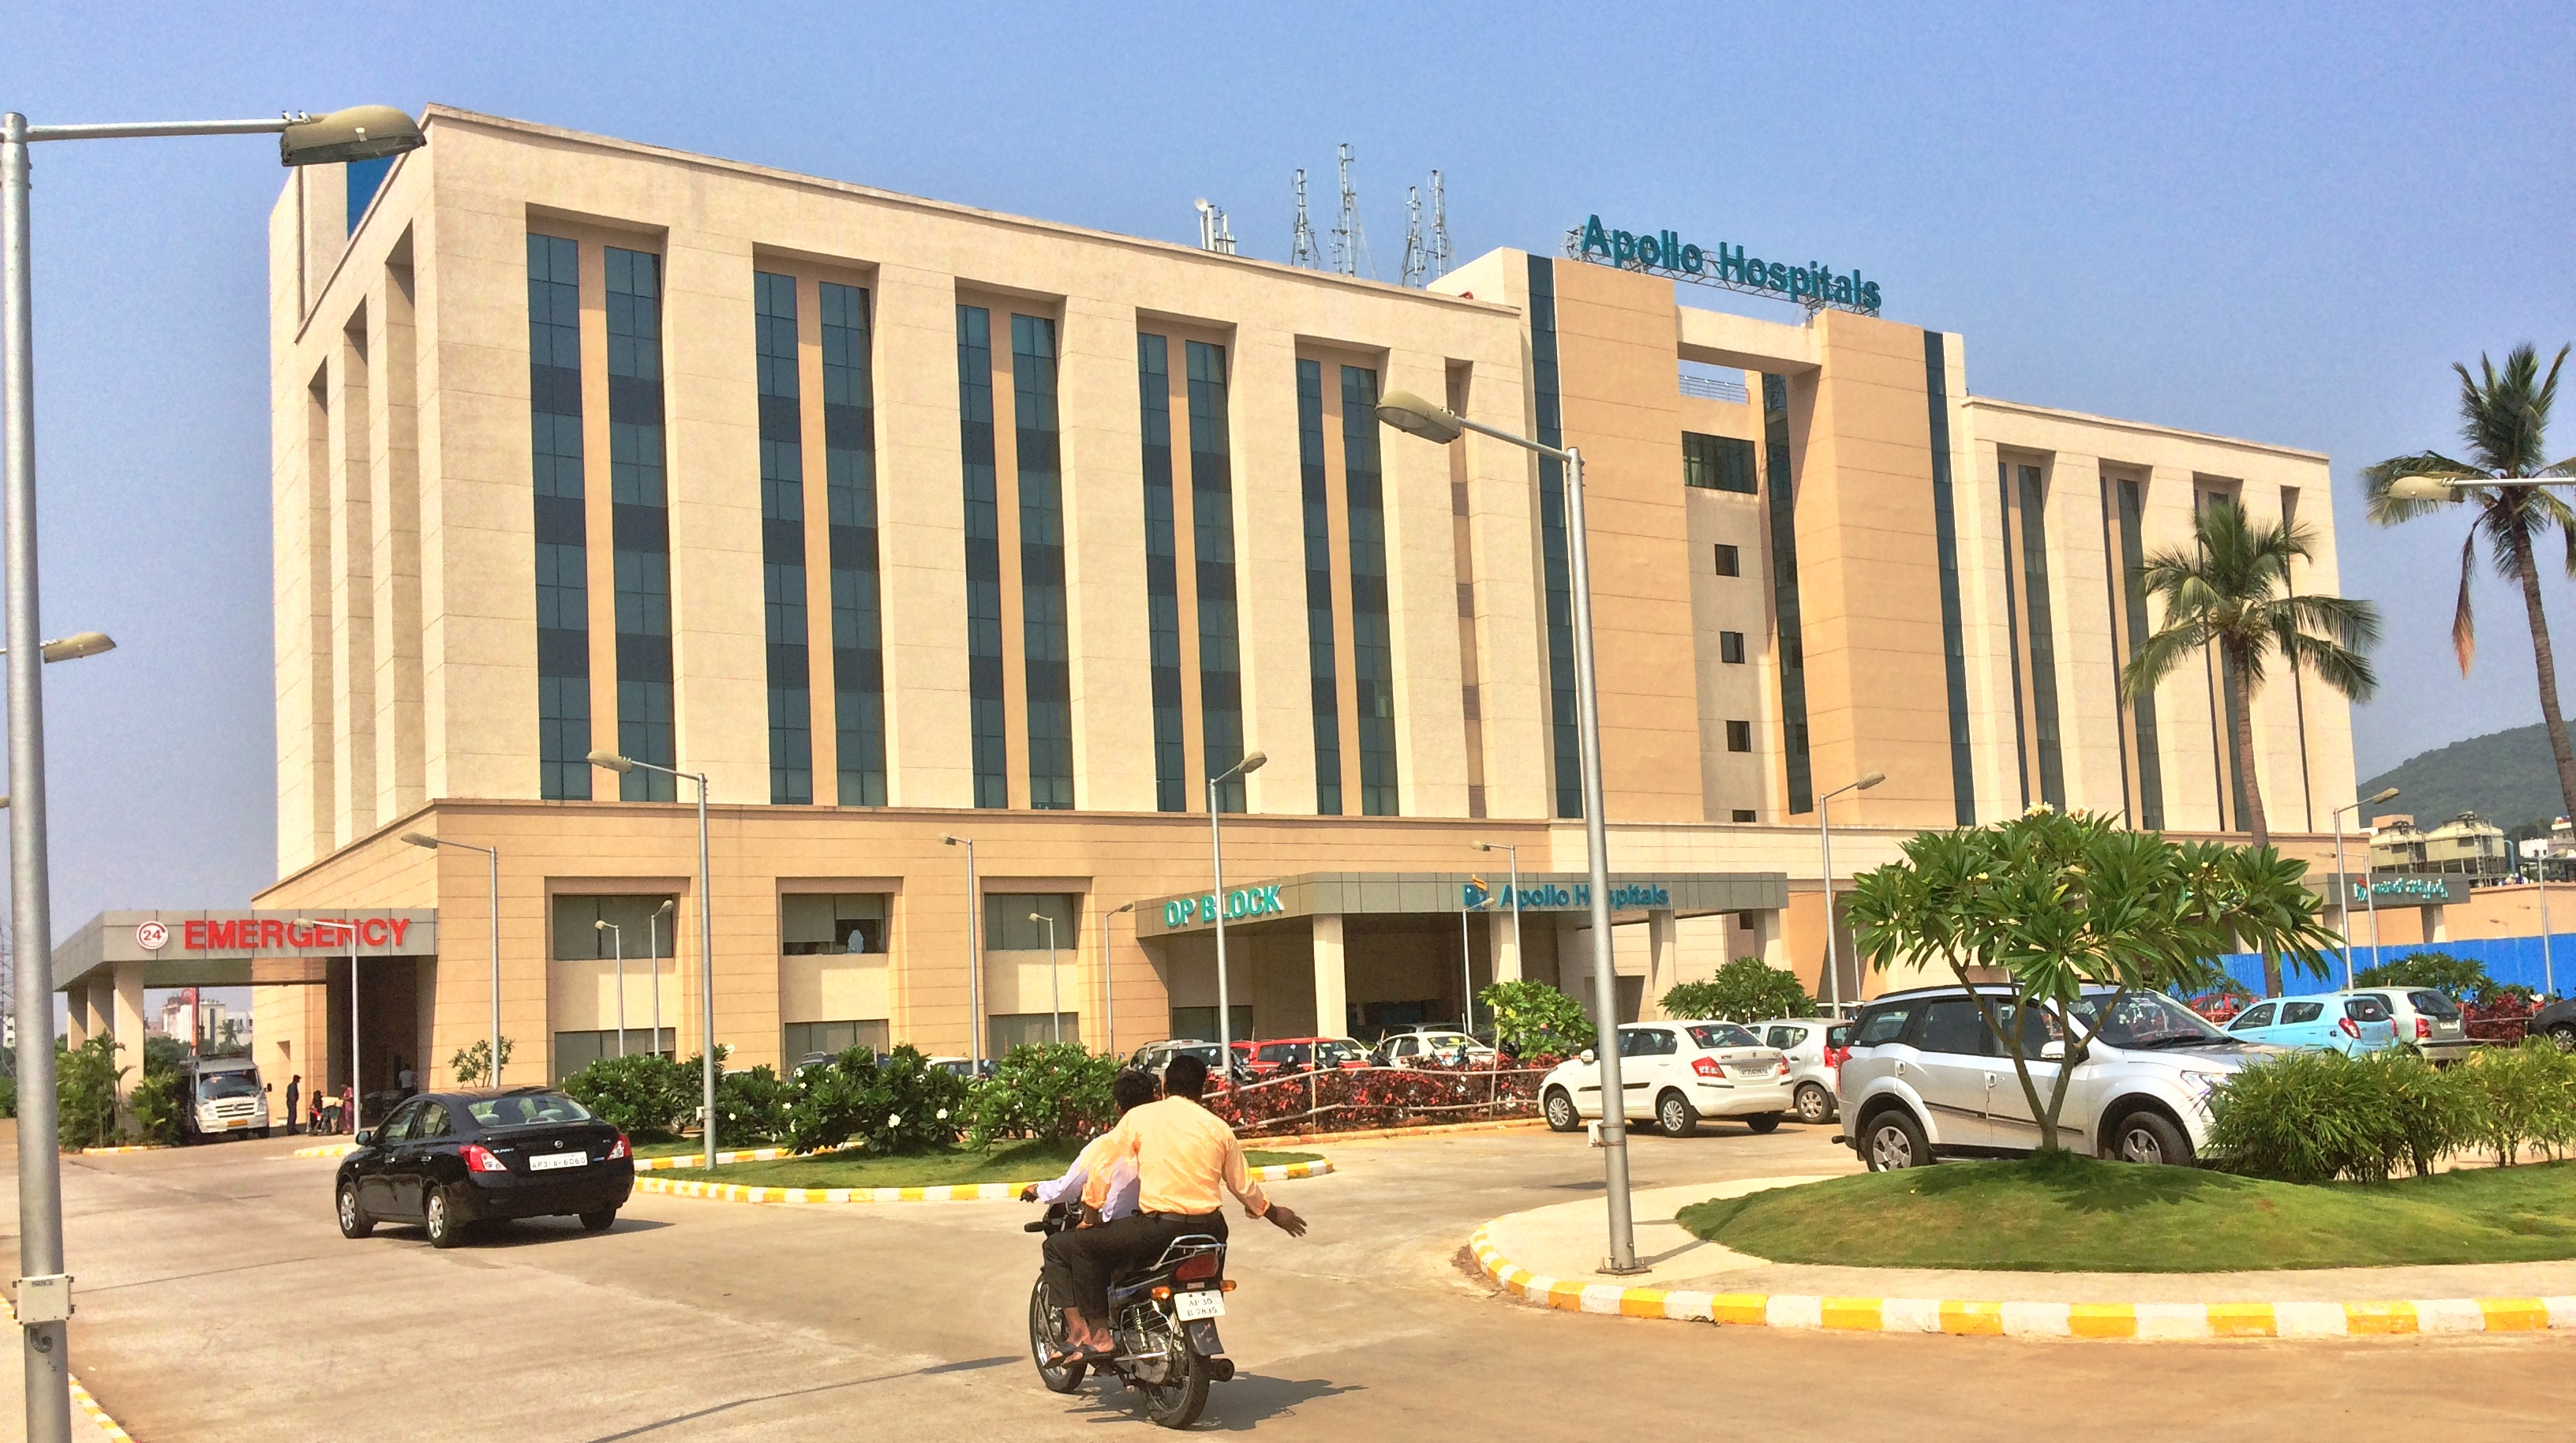 Apollo hospital bhubaneswar images AP Images: Editorial and Creative Photos Buy Photos